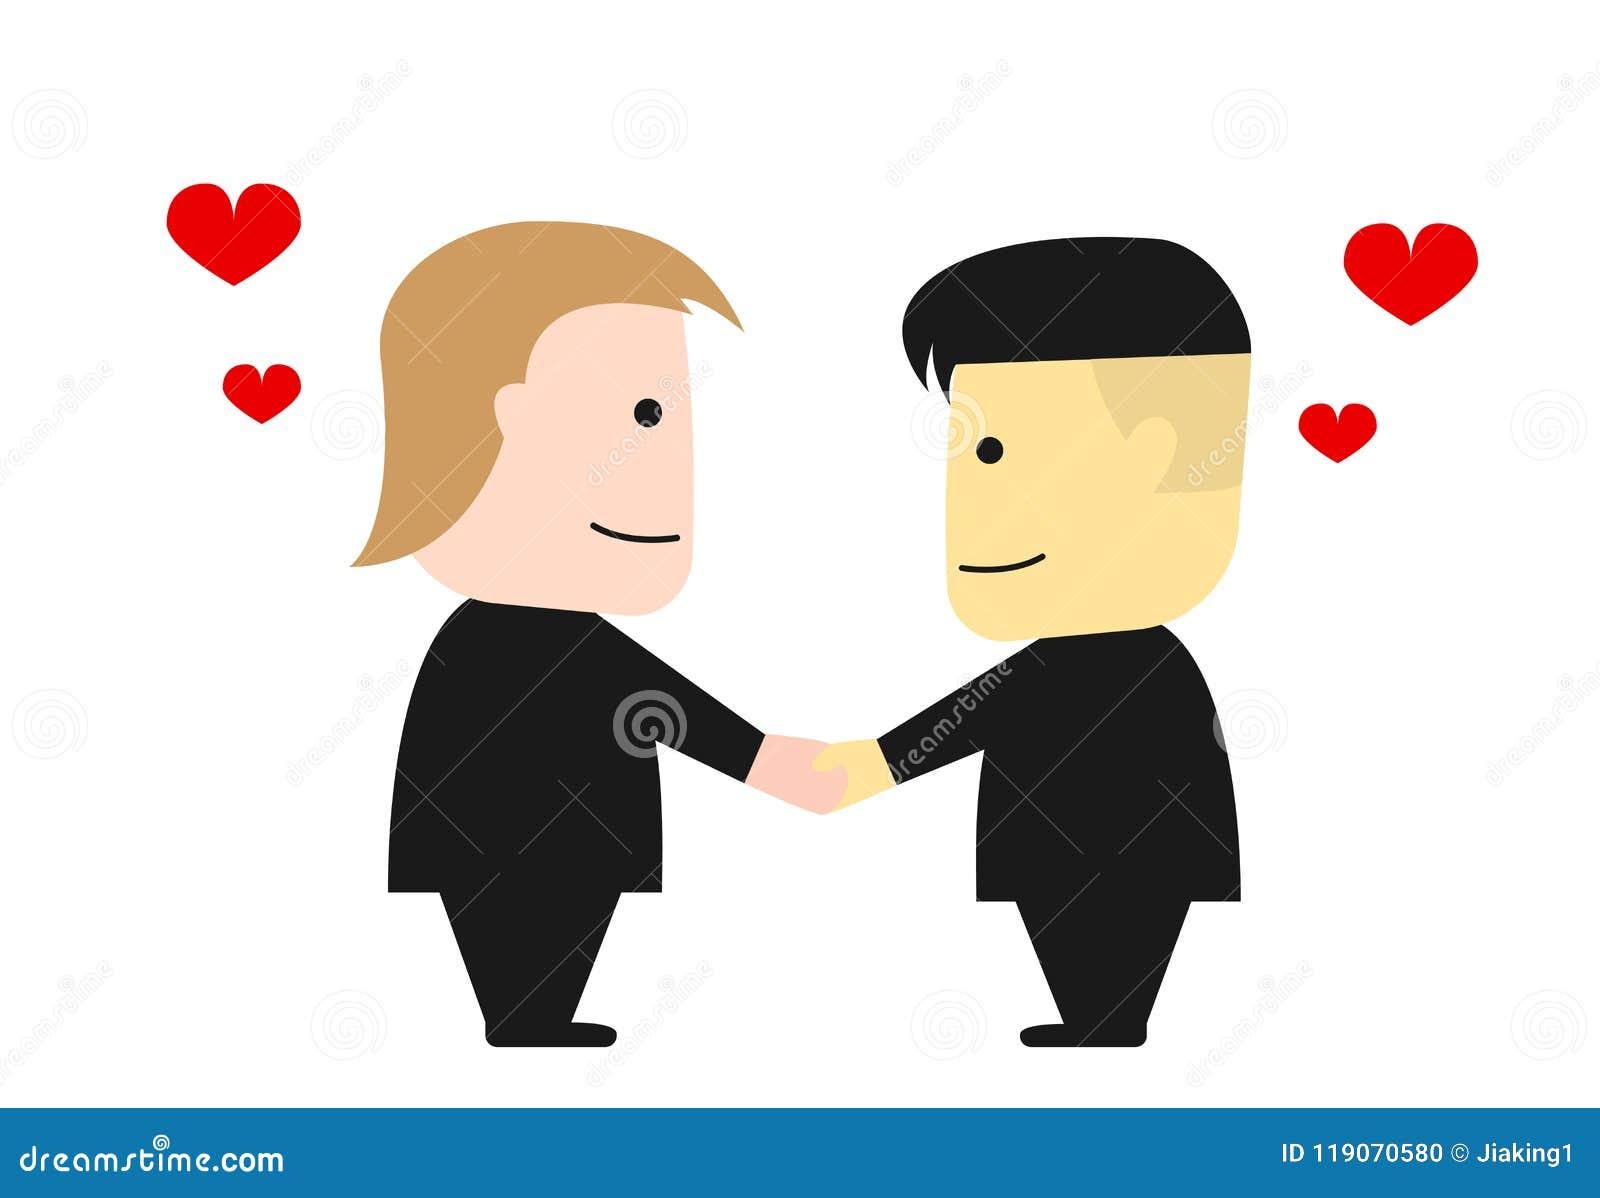 Donald Trump and Kim Jong Un shake hands, vector